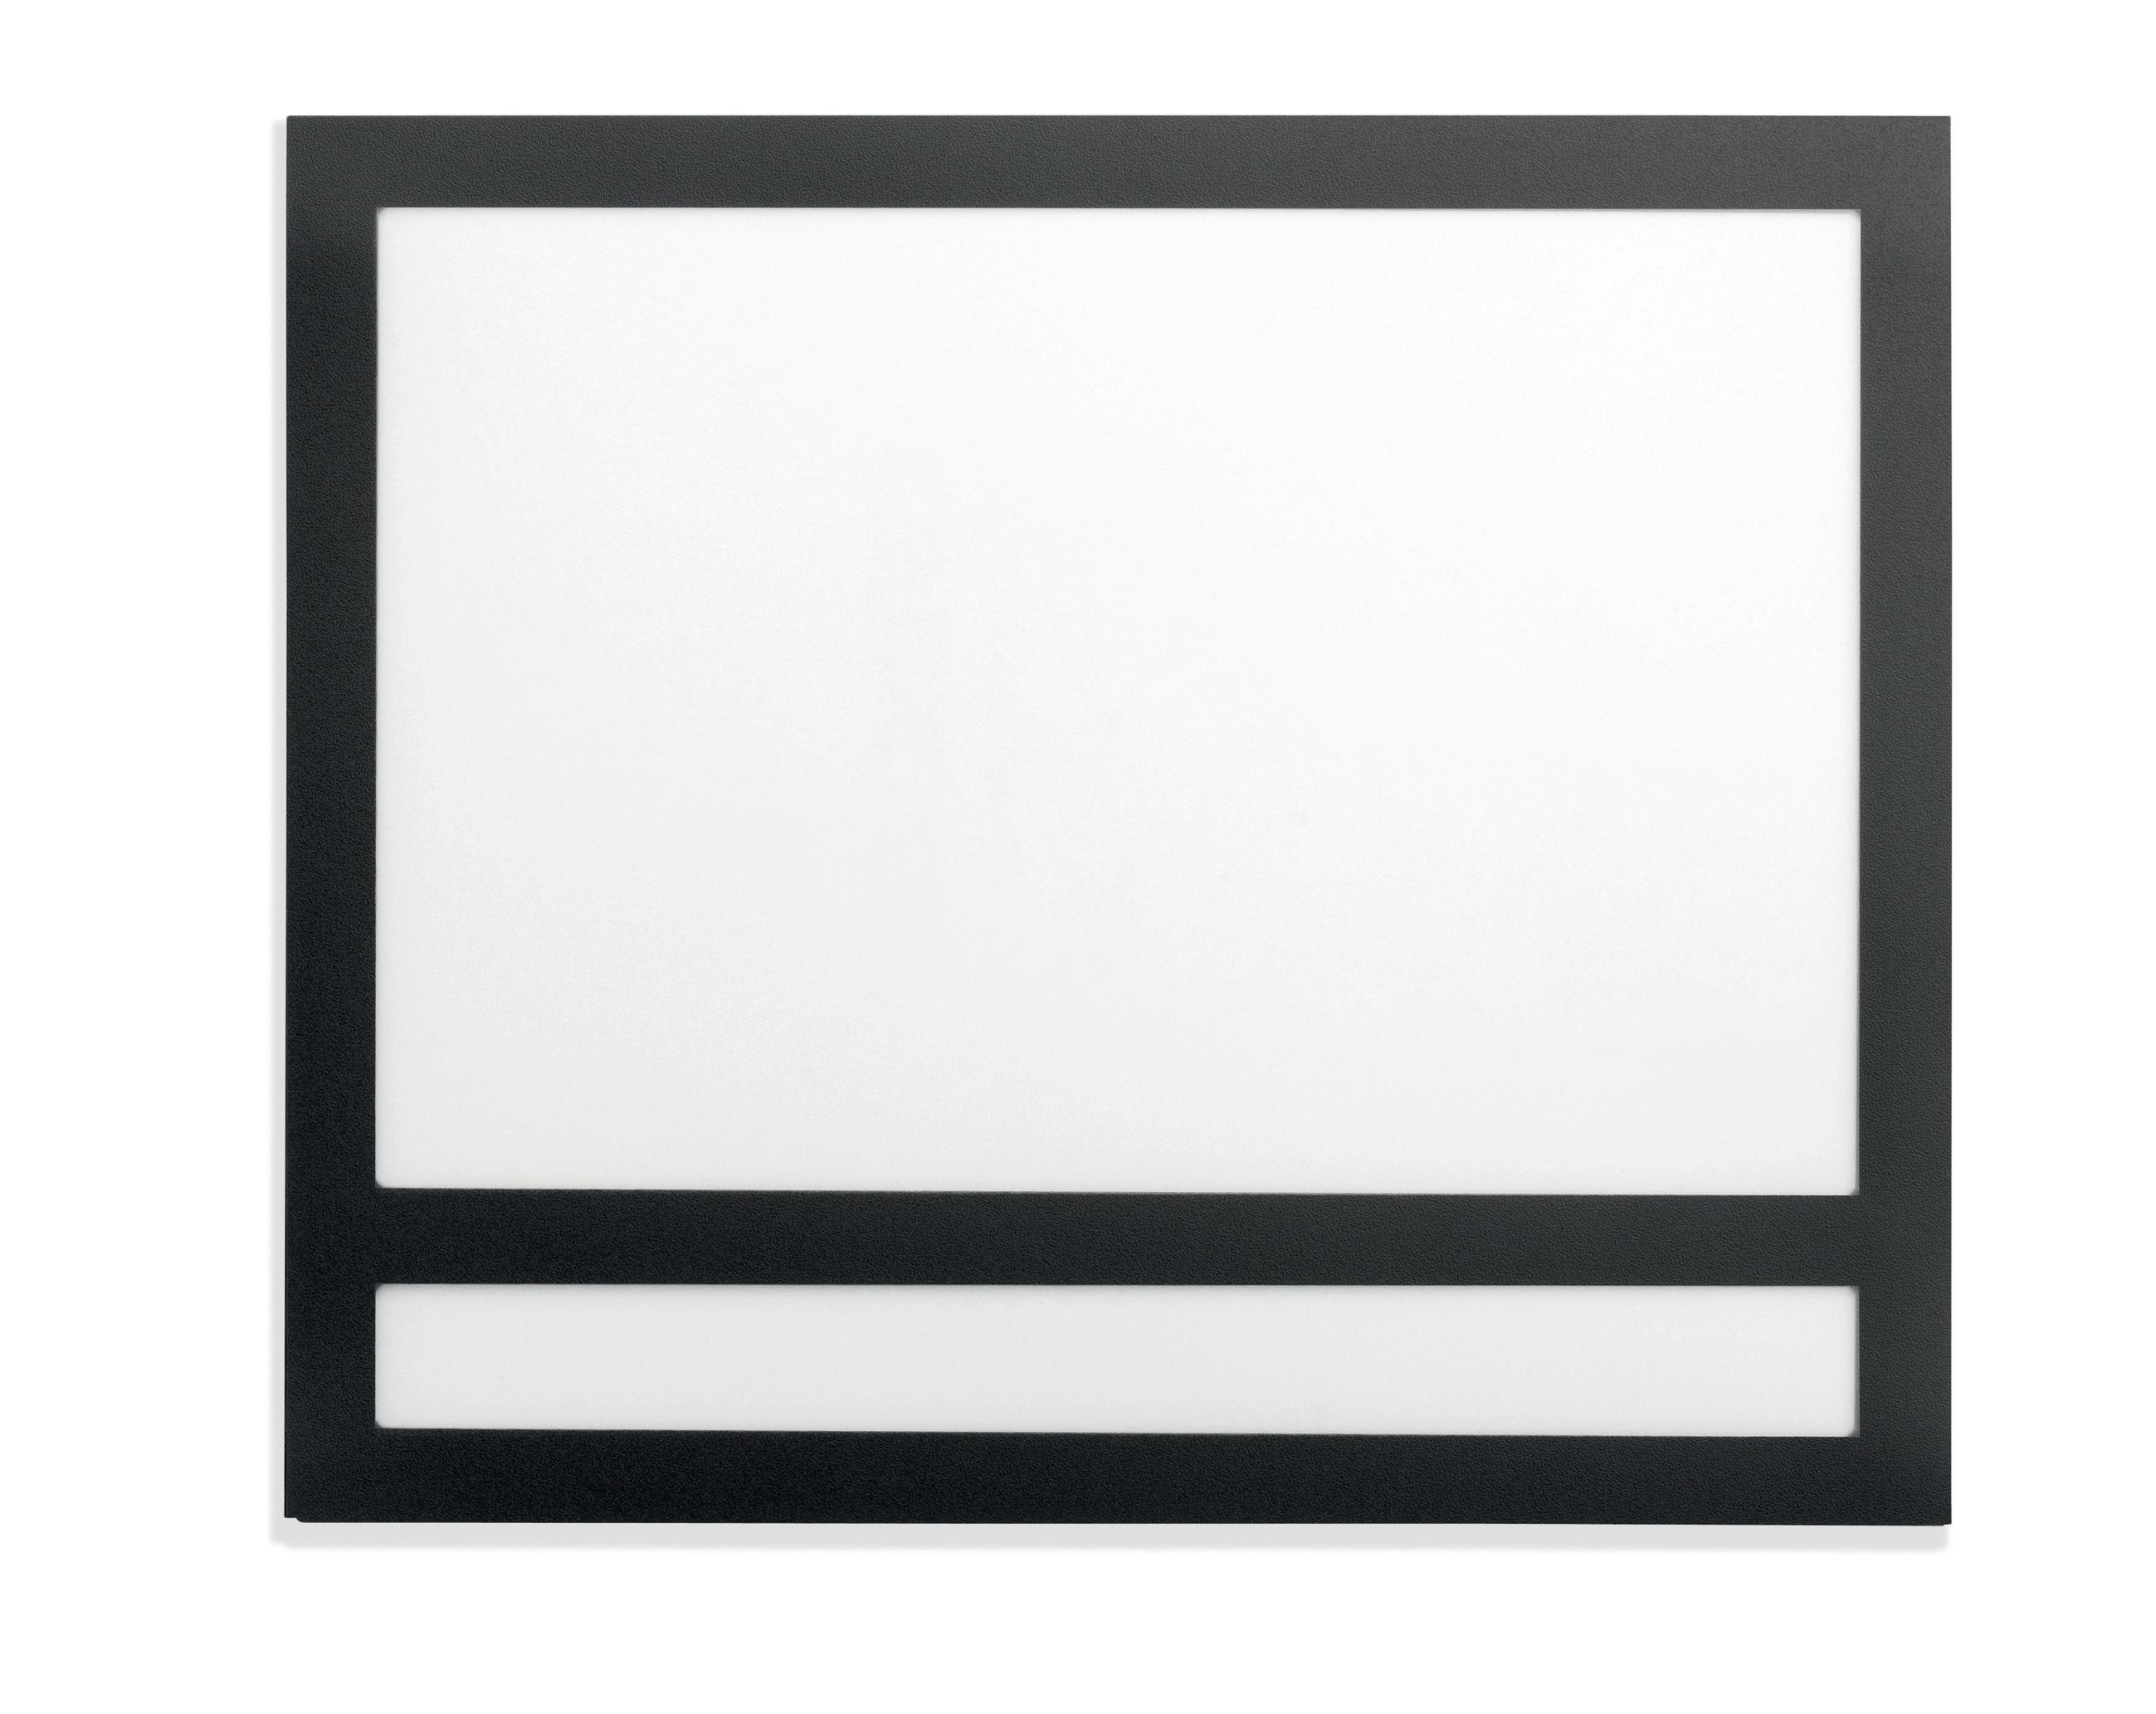 Durable Fotoframe Plus 10x15 cm - Black